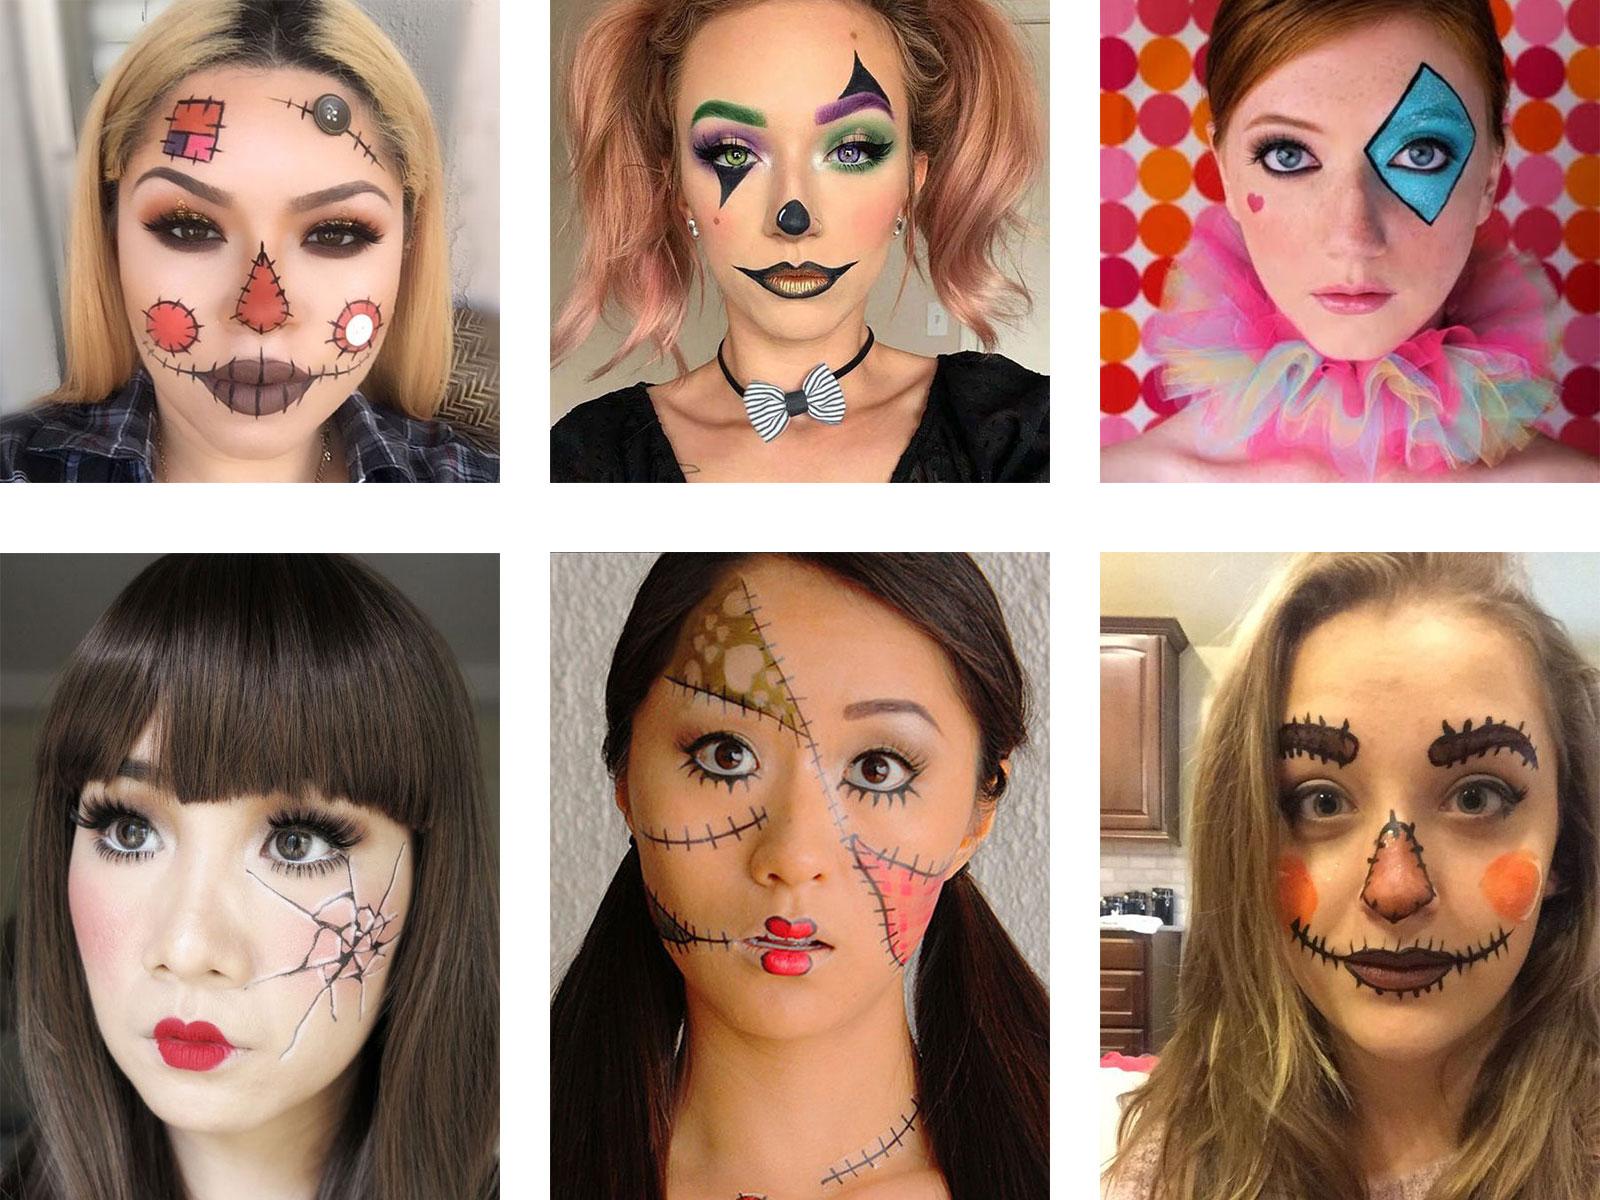 25 Last Minute Very Easy Halloween Makeup Looks Ideas 2019 Idea Halloween